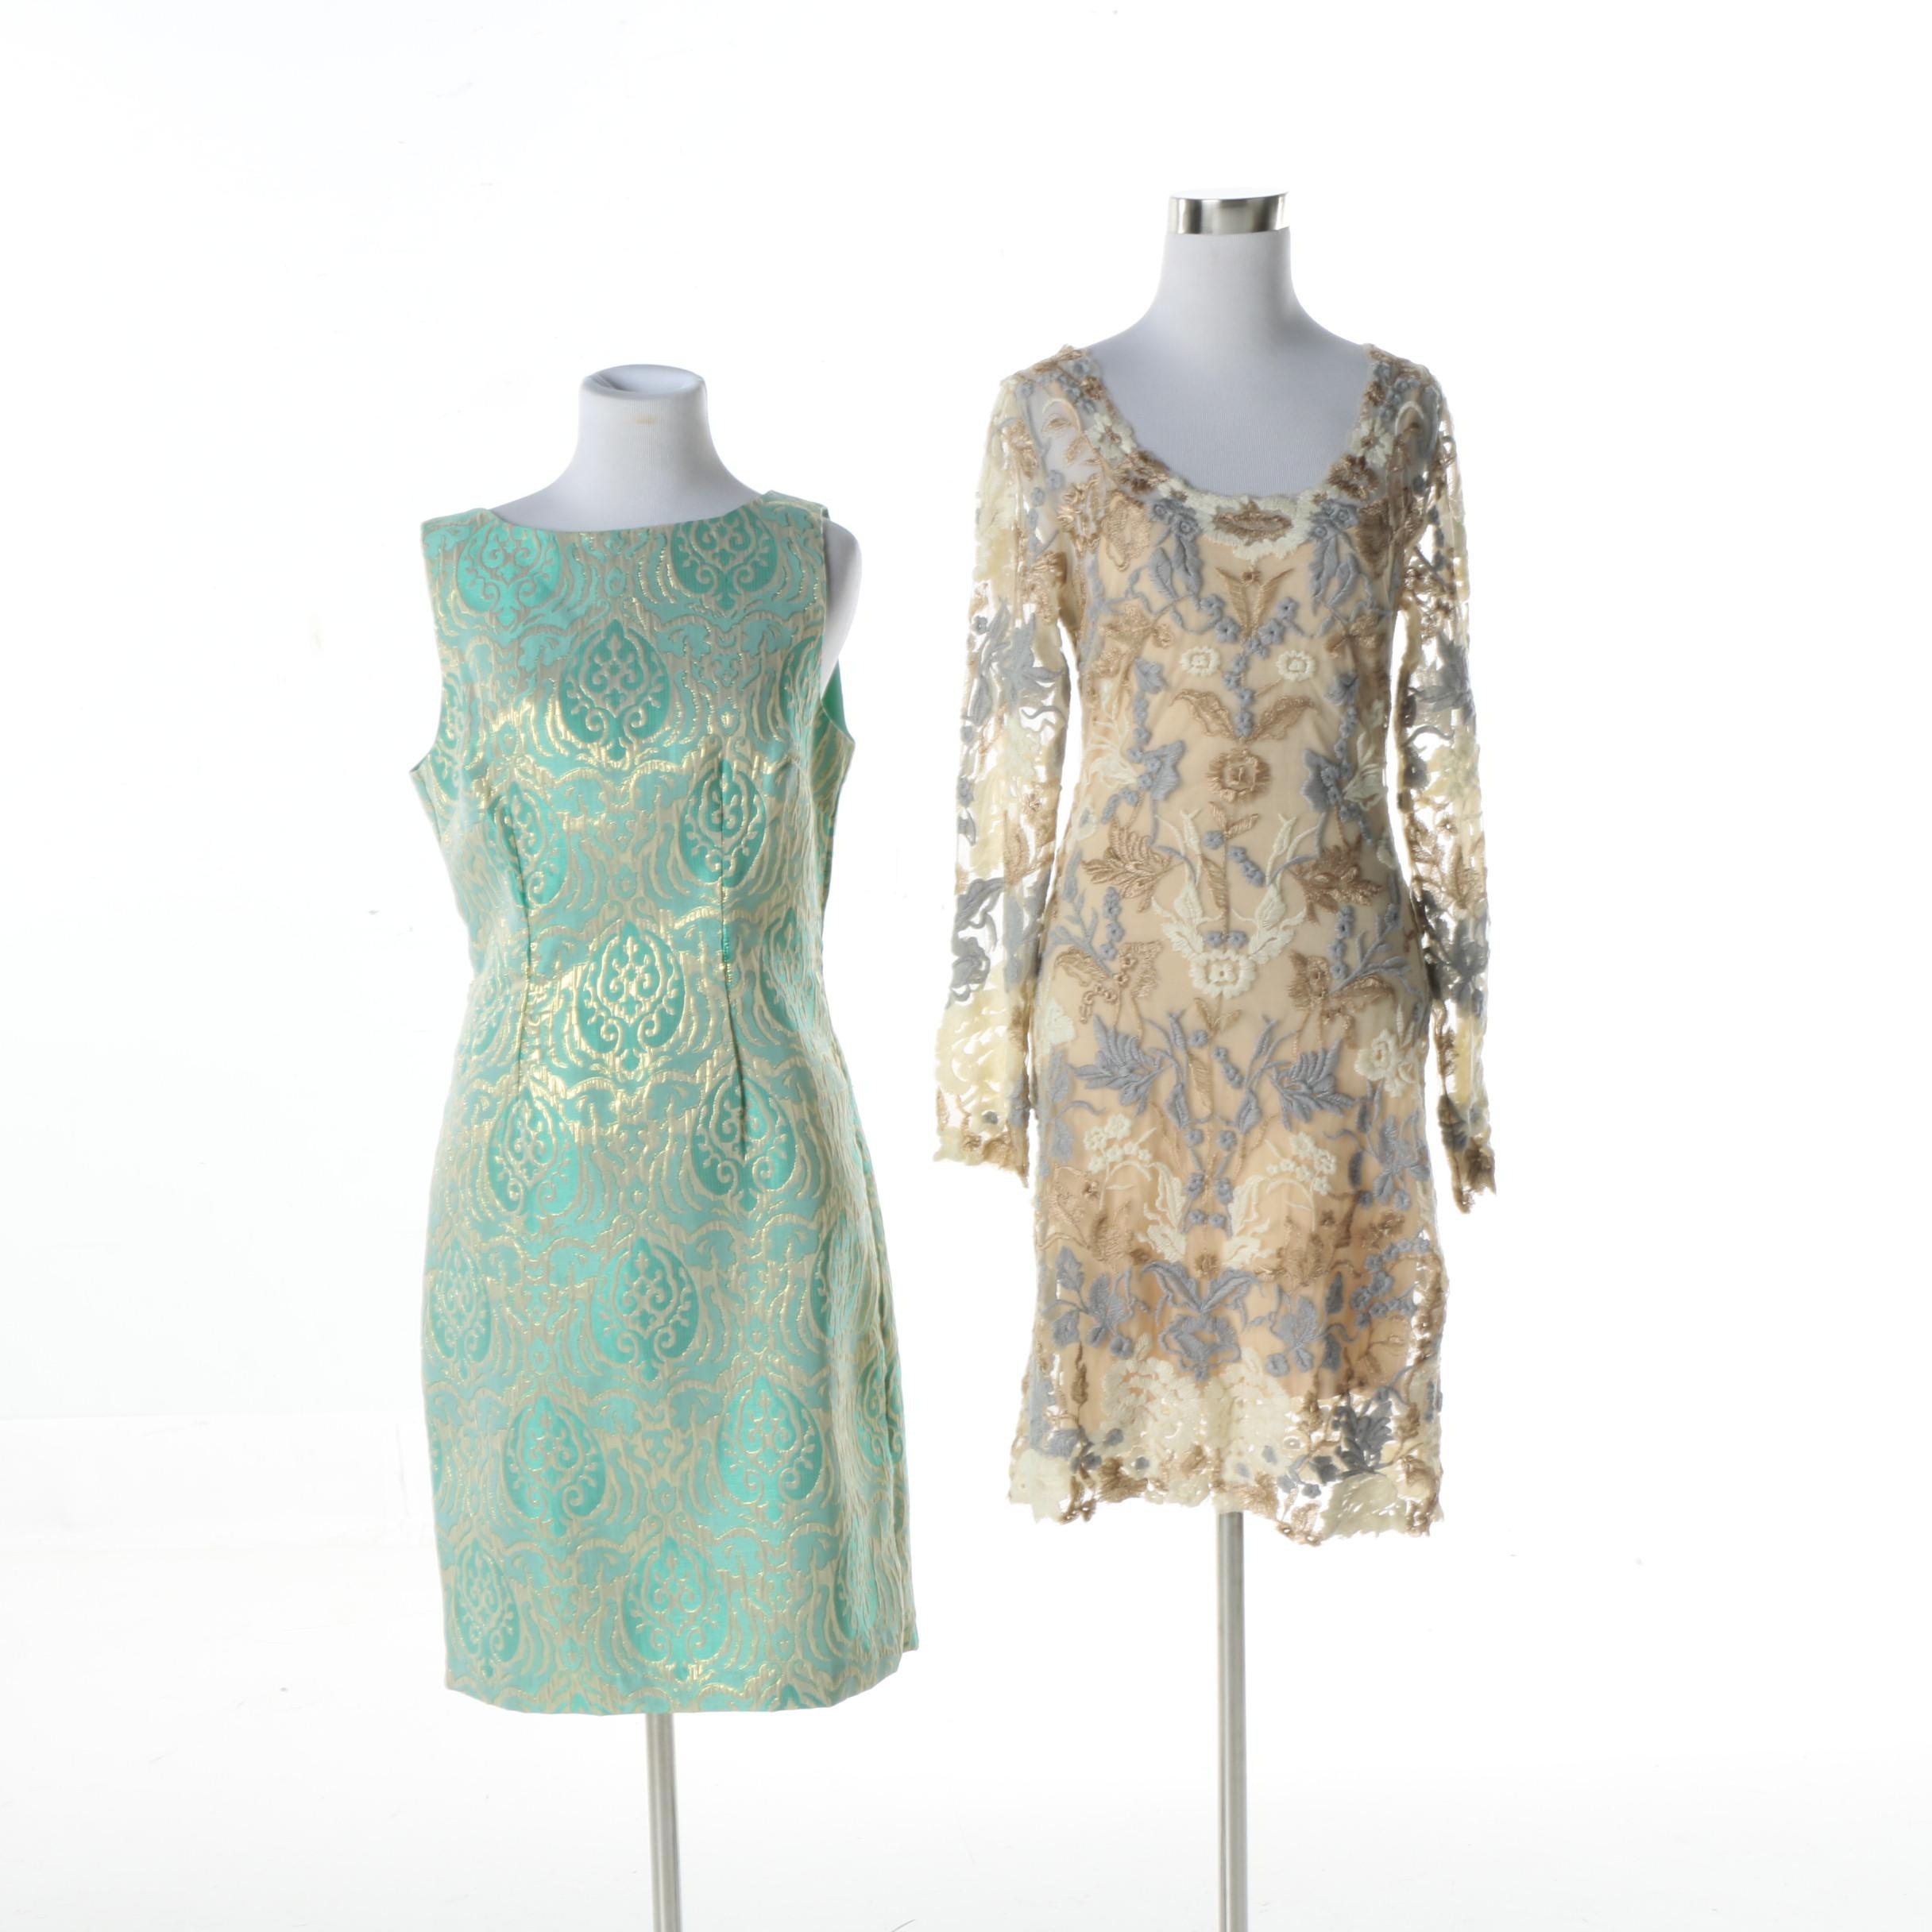 Women's Chetta B and Candela Sheath Dresses